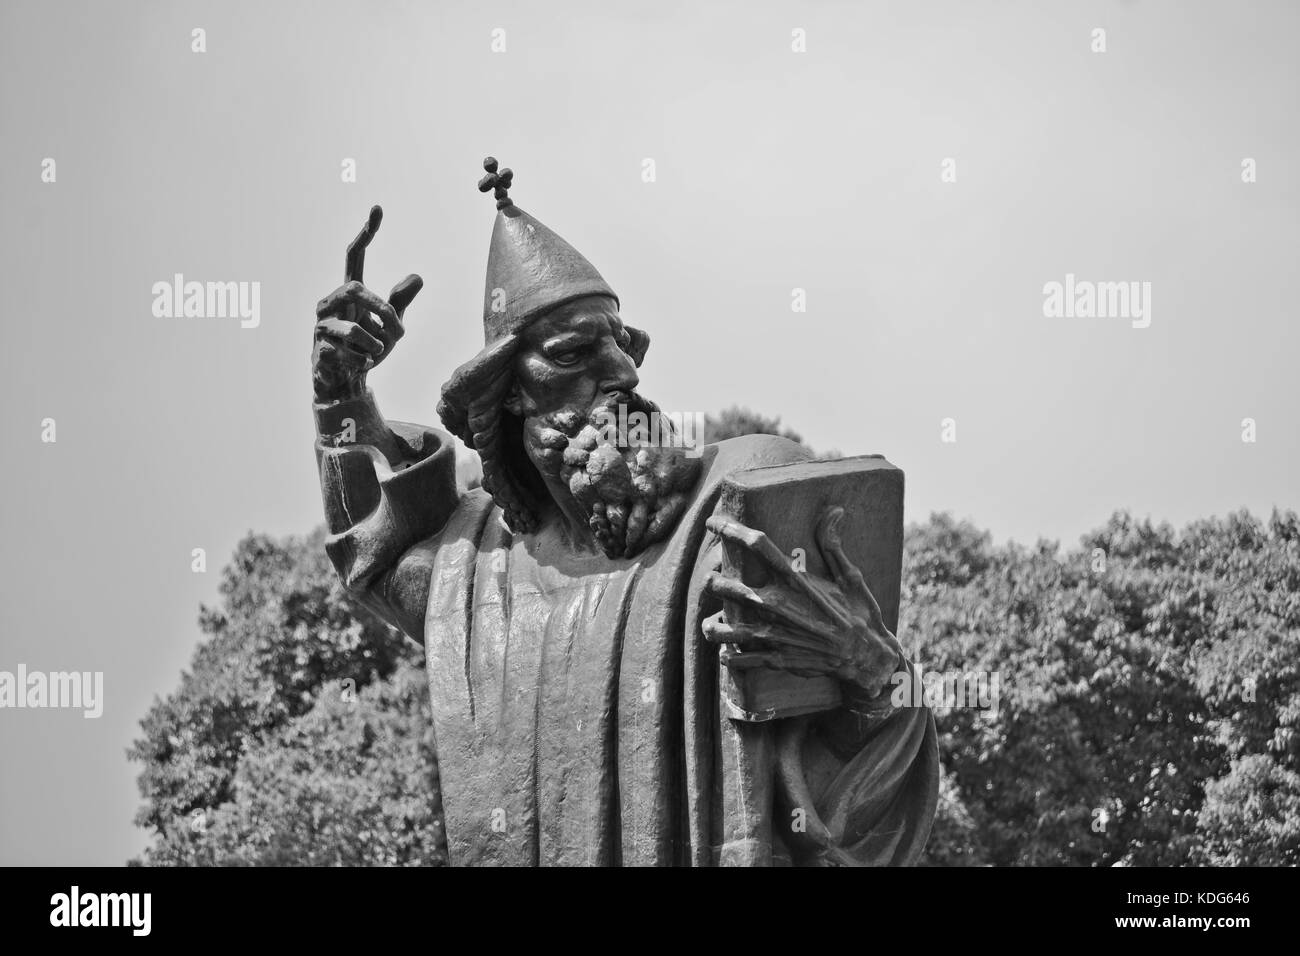 Statue of Gregory of Nin, by Ivan Mestrovic, Split, Croatia - Stock Image